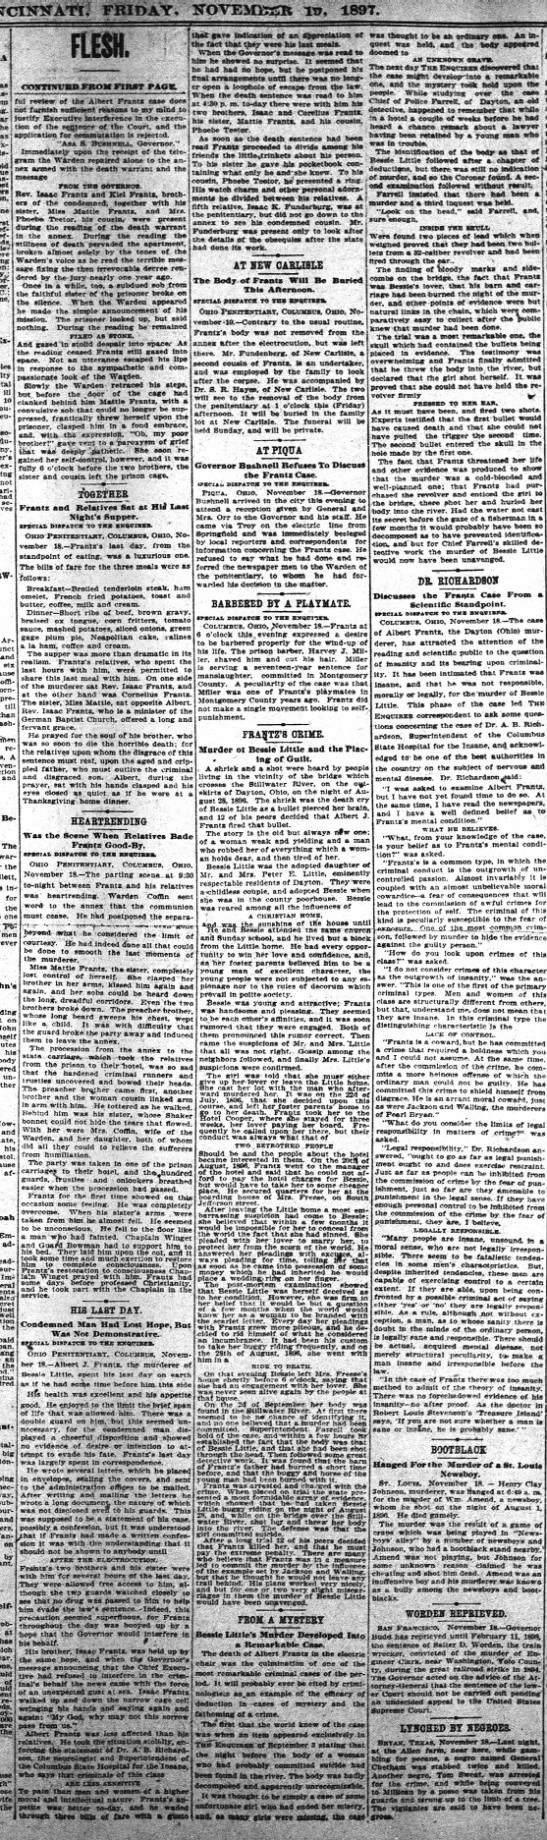 19 Nov. 1897, Cincinnati Enquirer, Part 2 (p.2)